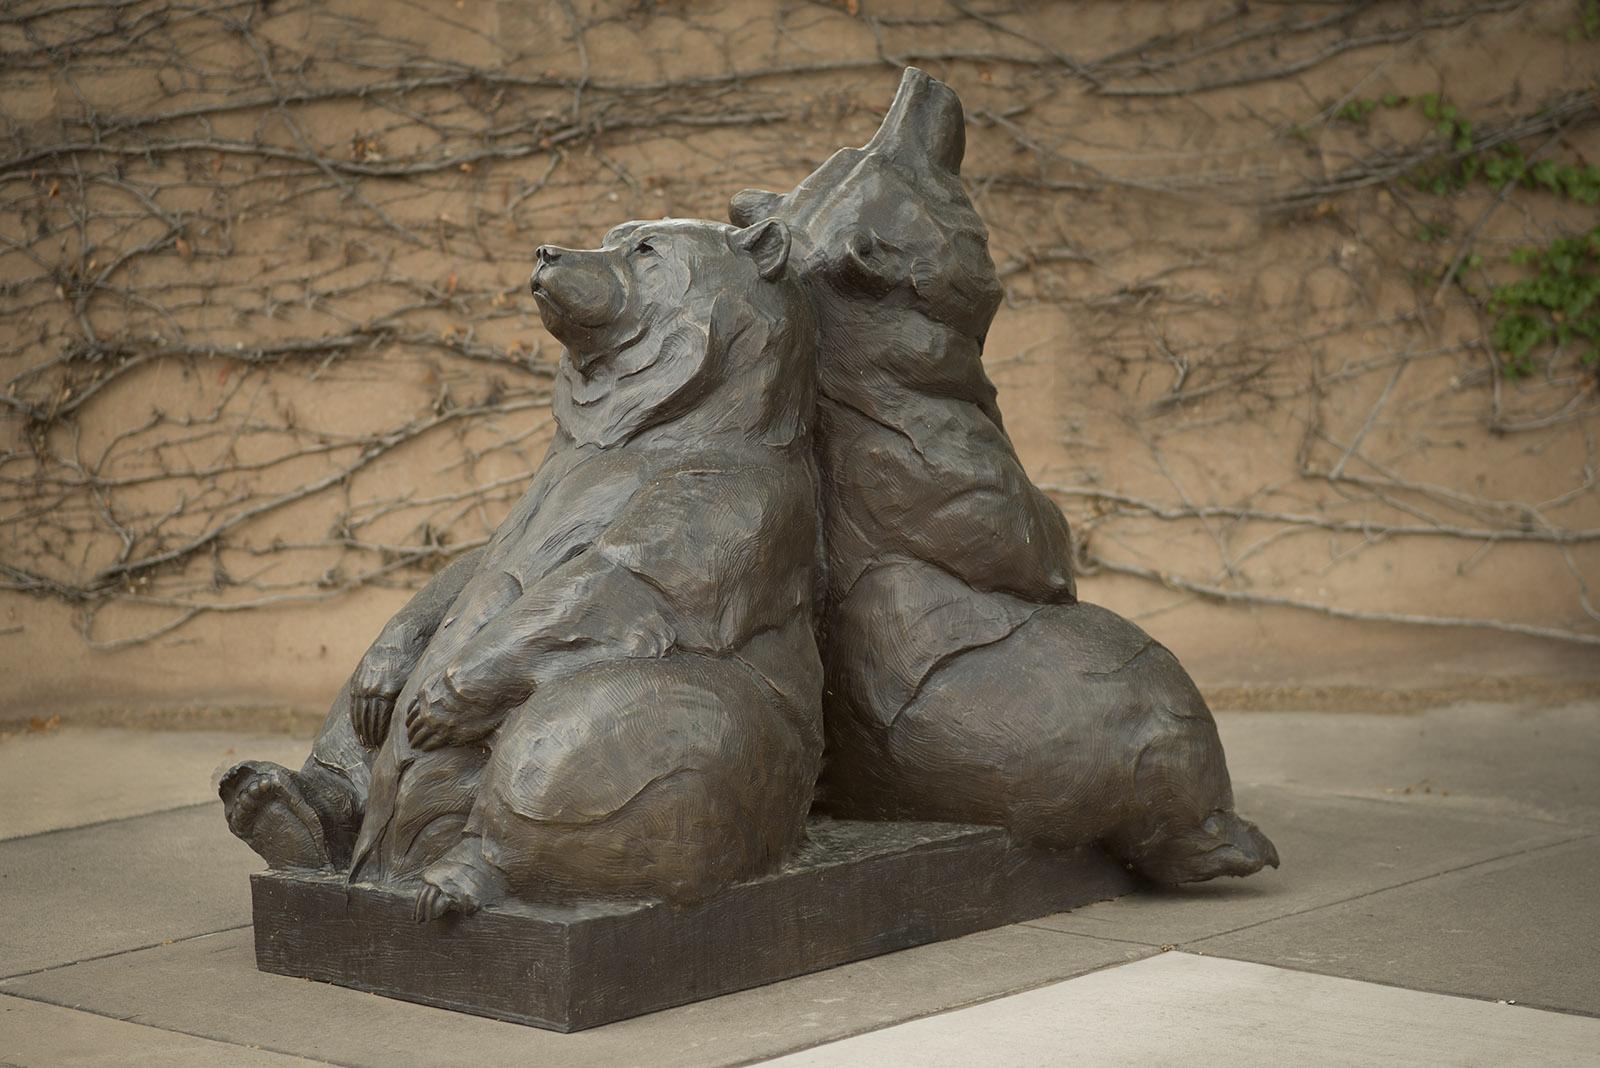 Dan Ostermiller, Les Bears